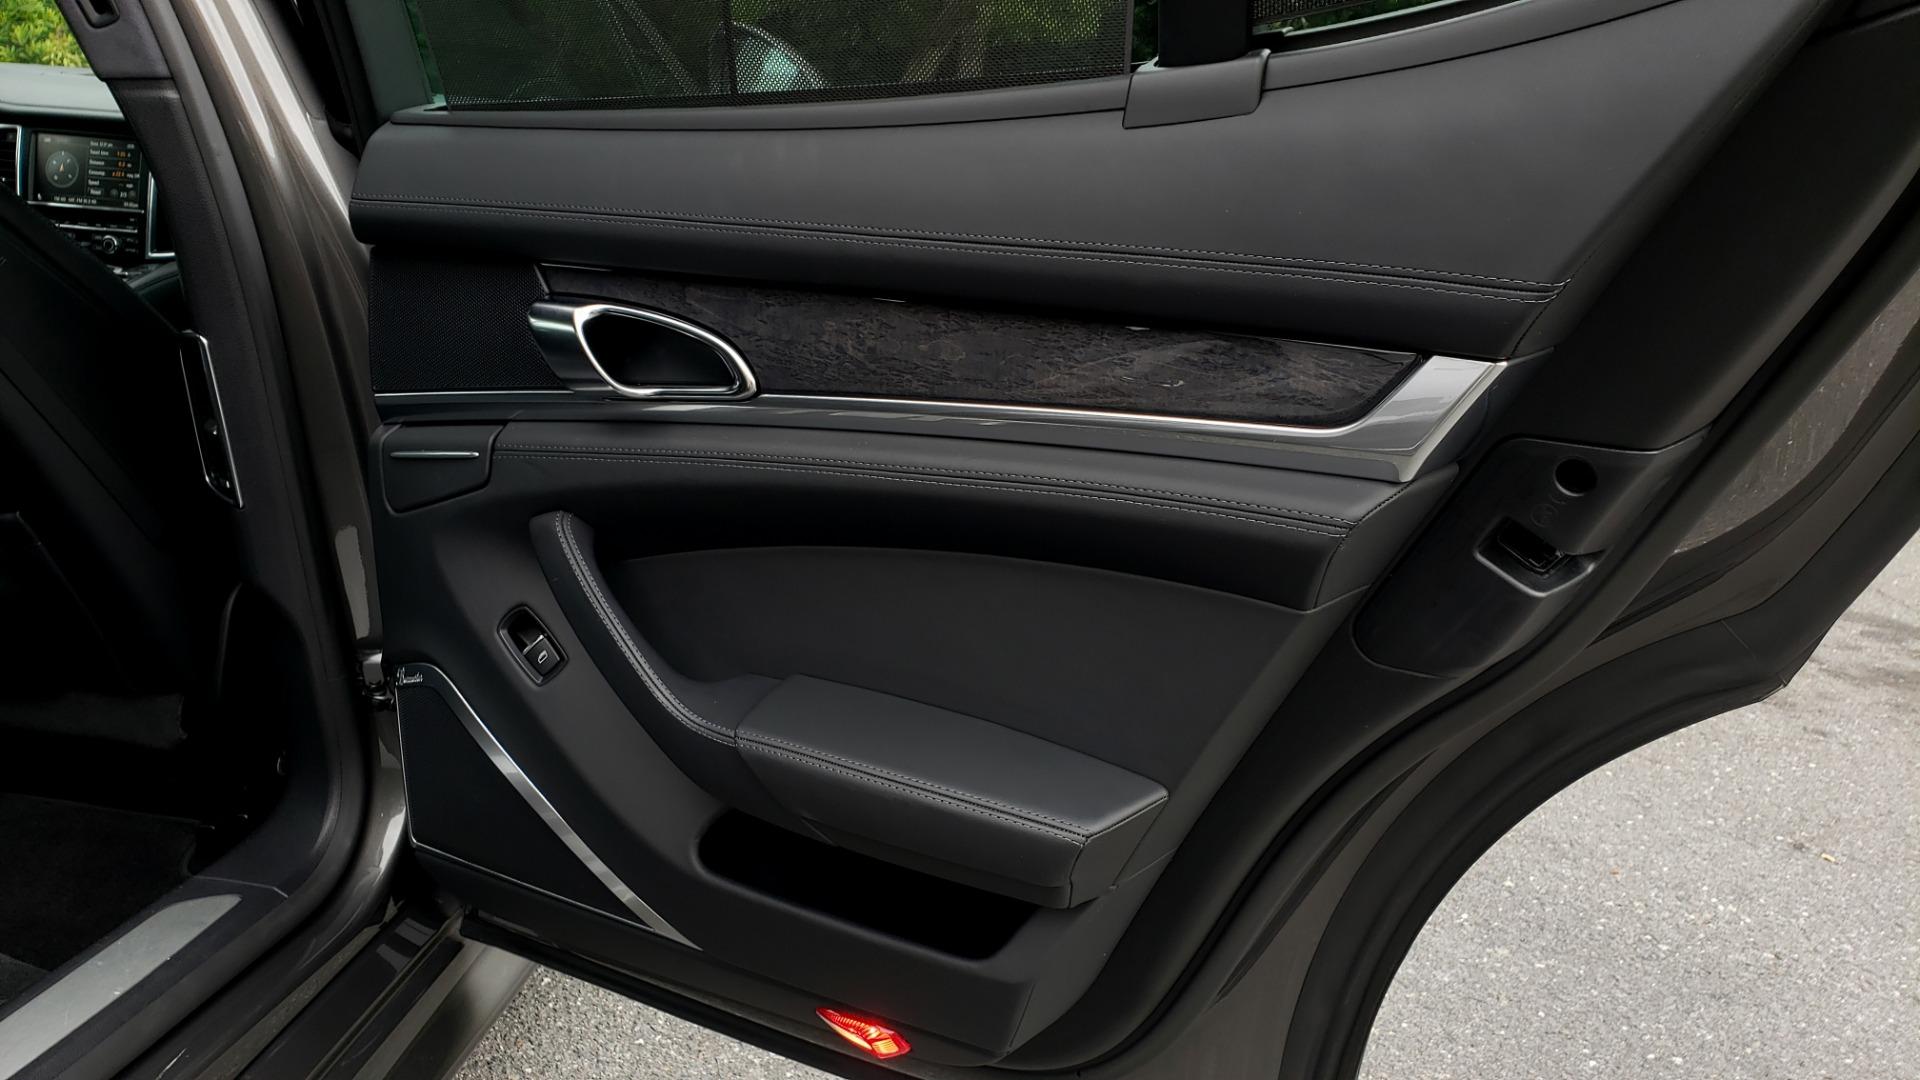 Used 2013 Porsche PANAMERA TURBO 4.8L V8 / AWD / NAV / SUNROOF / LCA / PARK ASST / BURMESTER for sale $45,995 at Formula Imports in Charlotte NC 28227 75